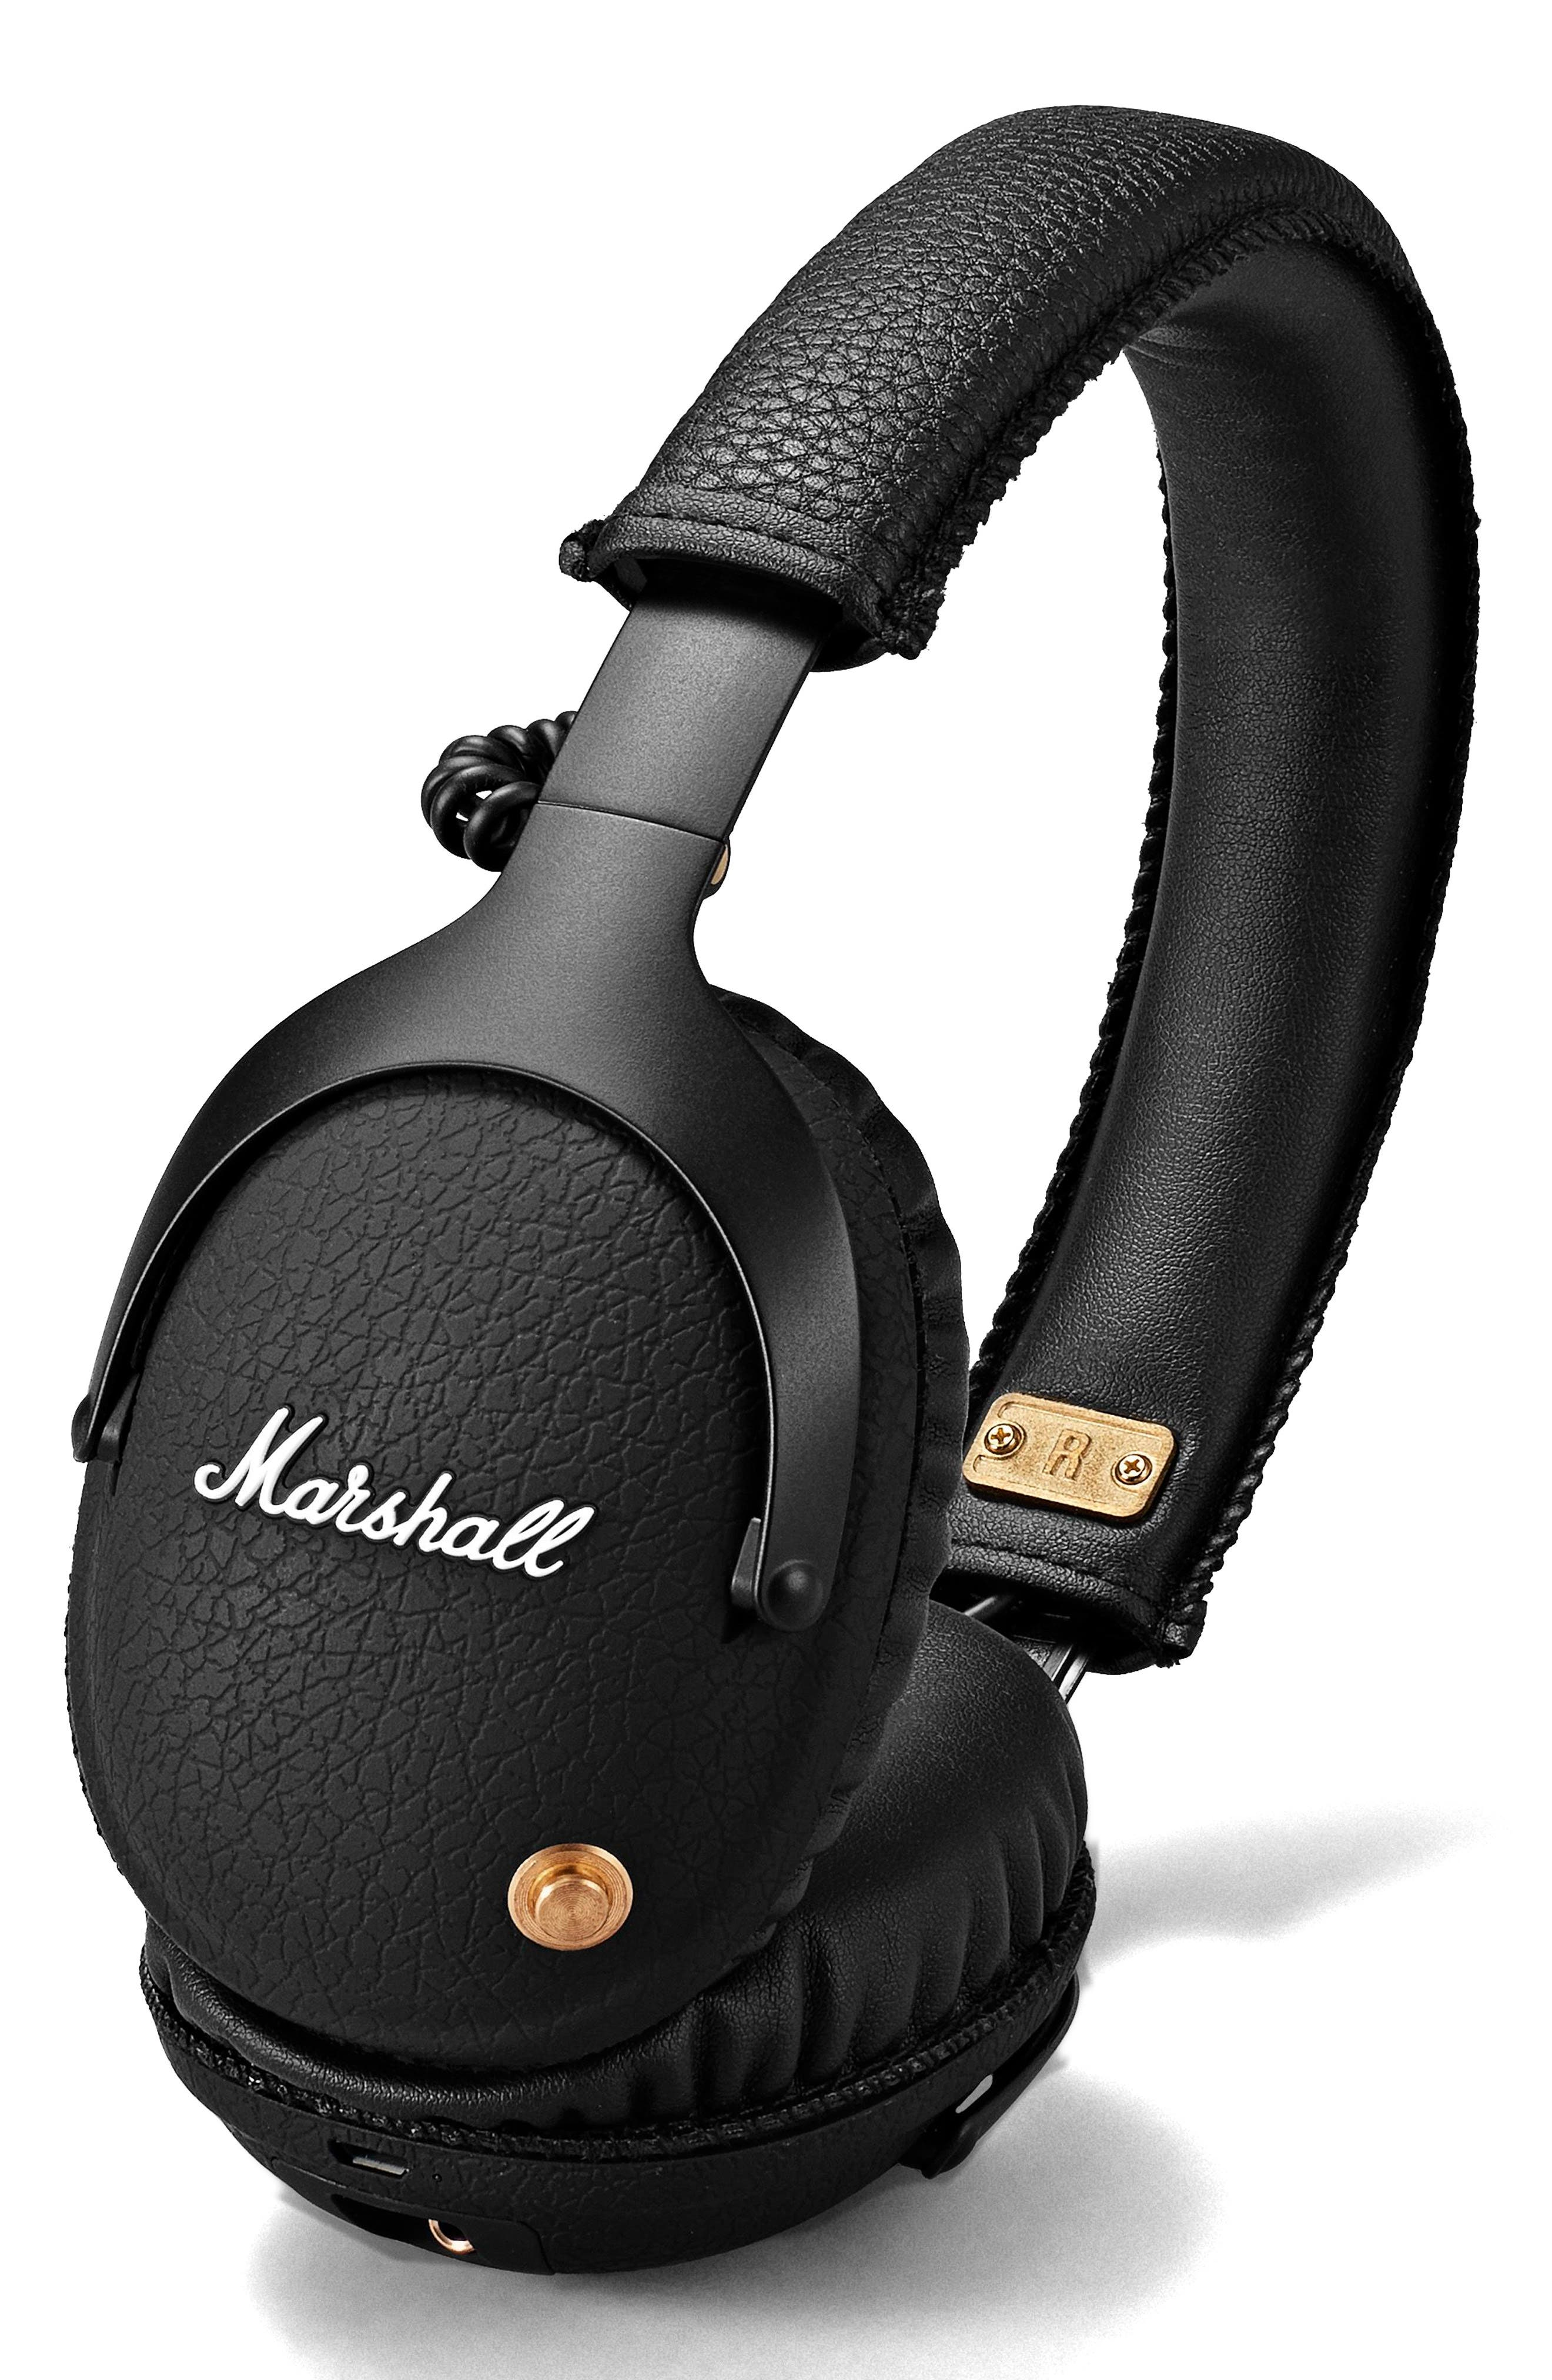 Alternate Image 1 Selected - Marshall Monitor Bluetooth Wireless Over Ear Headphones